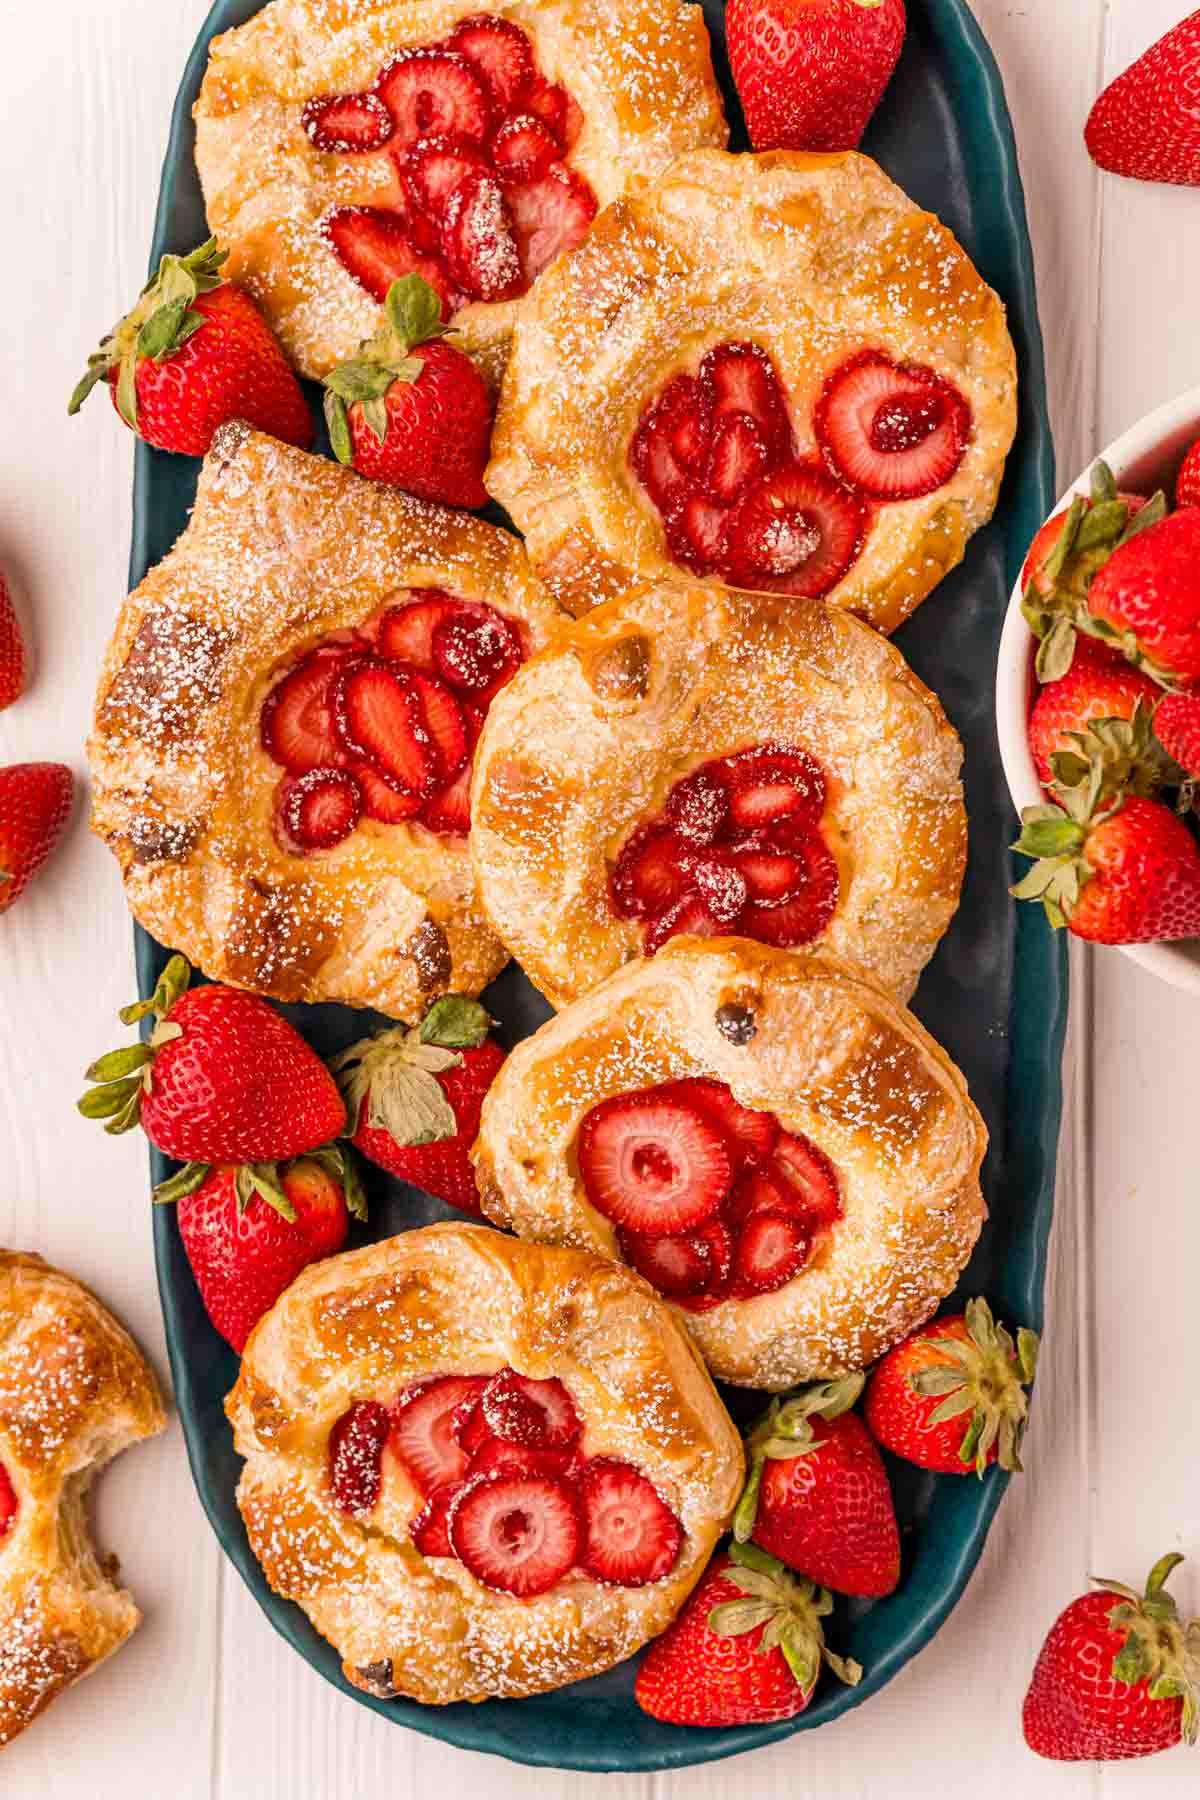 plate full of strawberry danishes with strawberries around